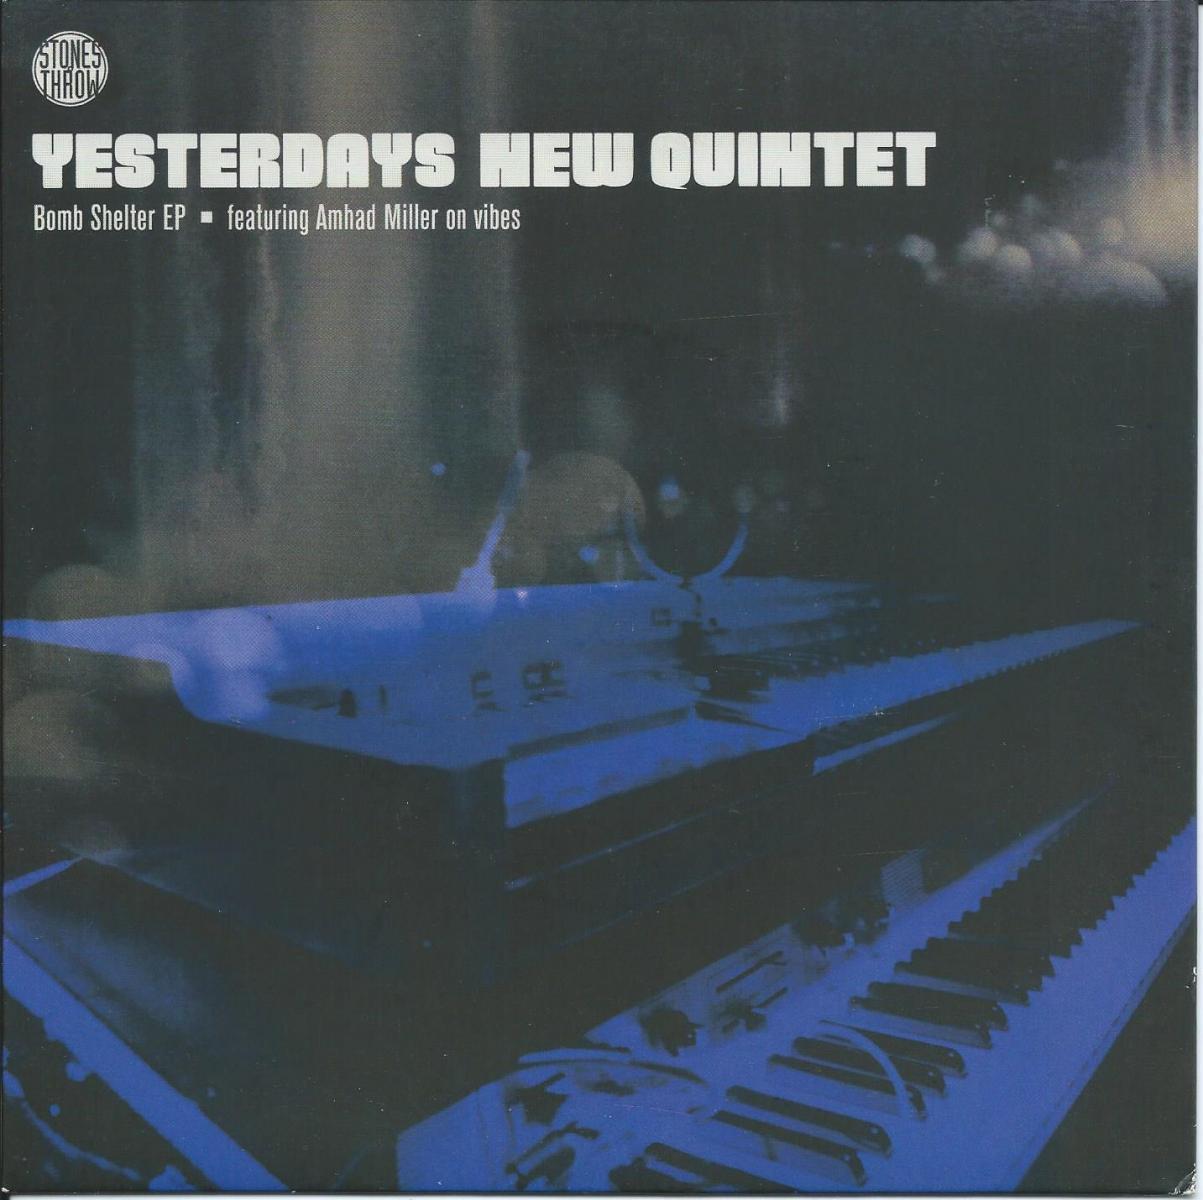 YESTERDAYS NEW QUINTET / BOMB SHELTER EP (7